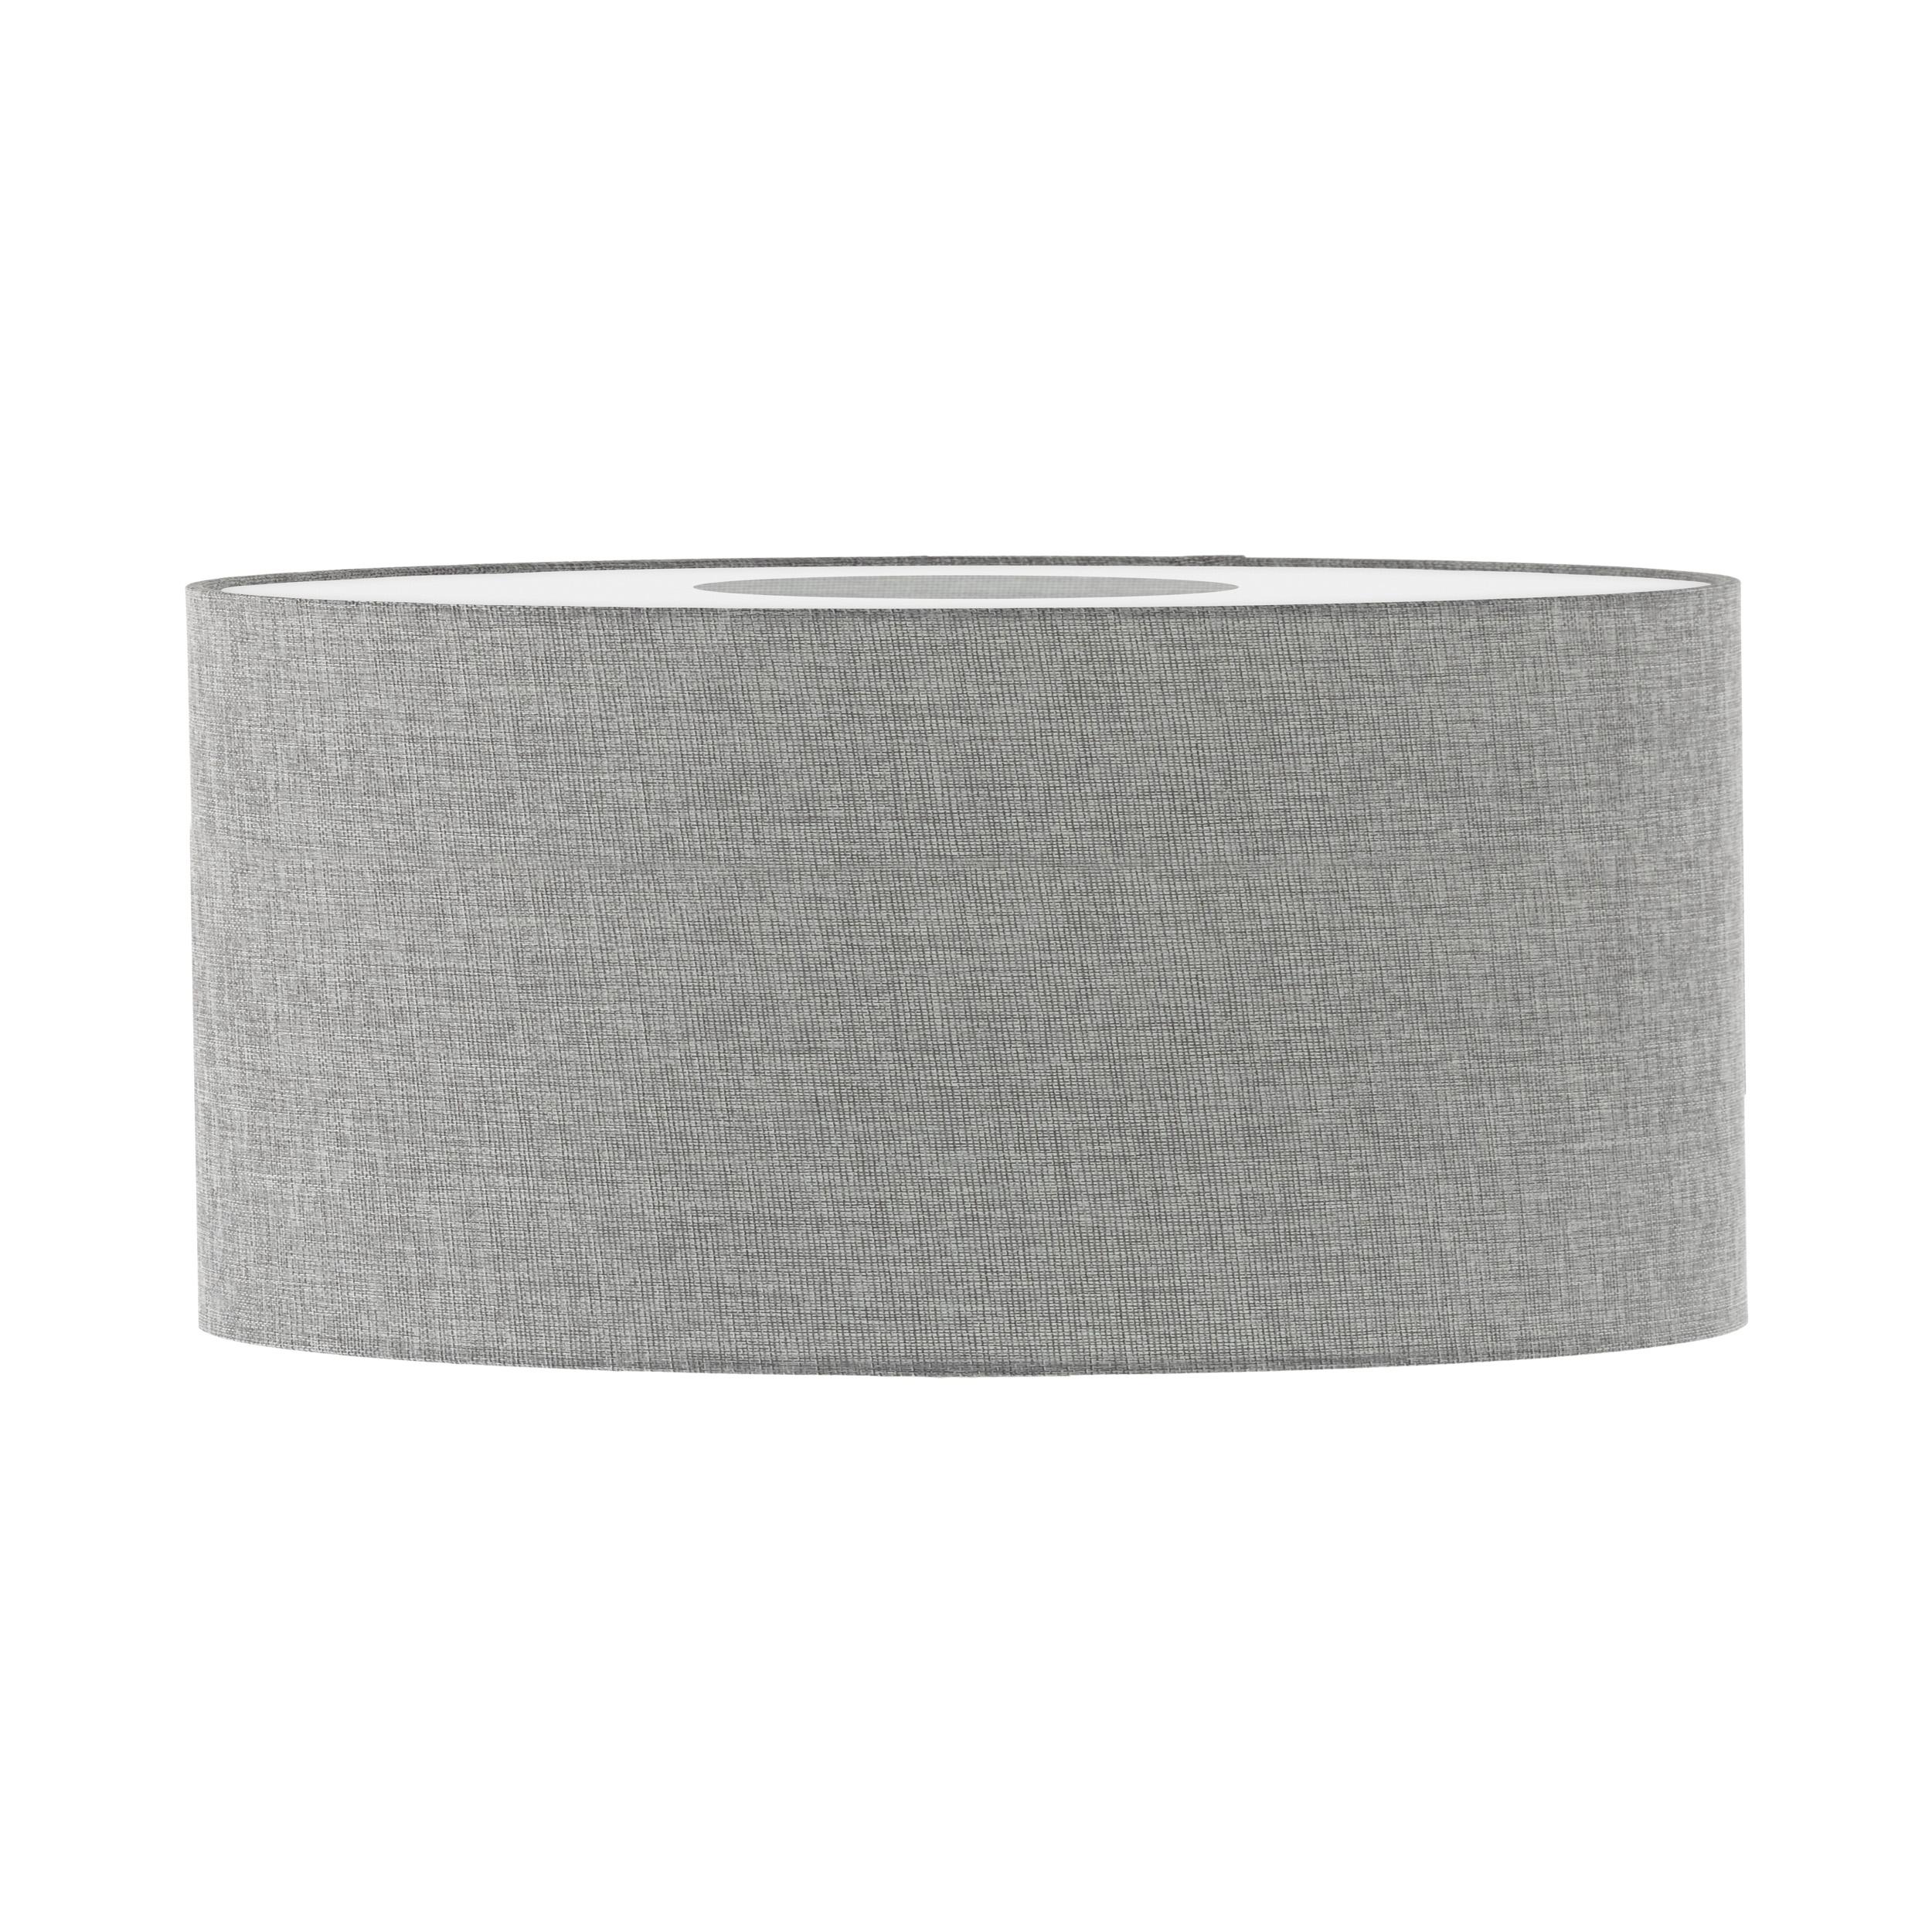 1 Stk Schirm Pasteri Pro inkl. Diffuser leinen grau  LI62703---